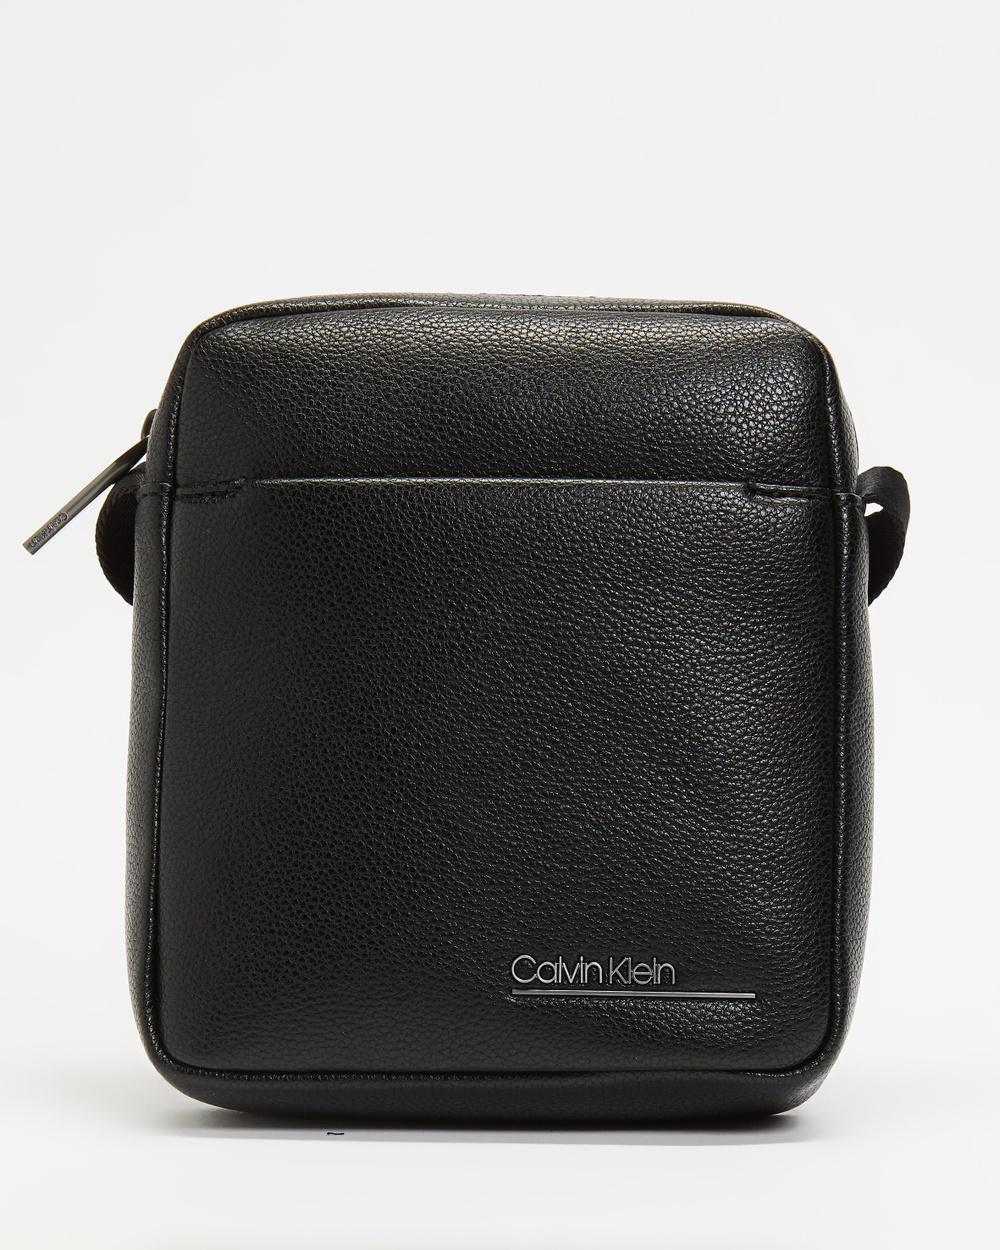 Calvin Klein Small Crossbody Bag Bags Black Cross-body bags Australia